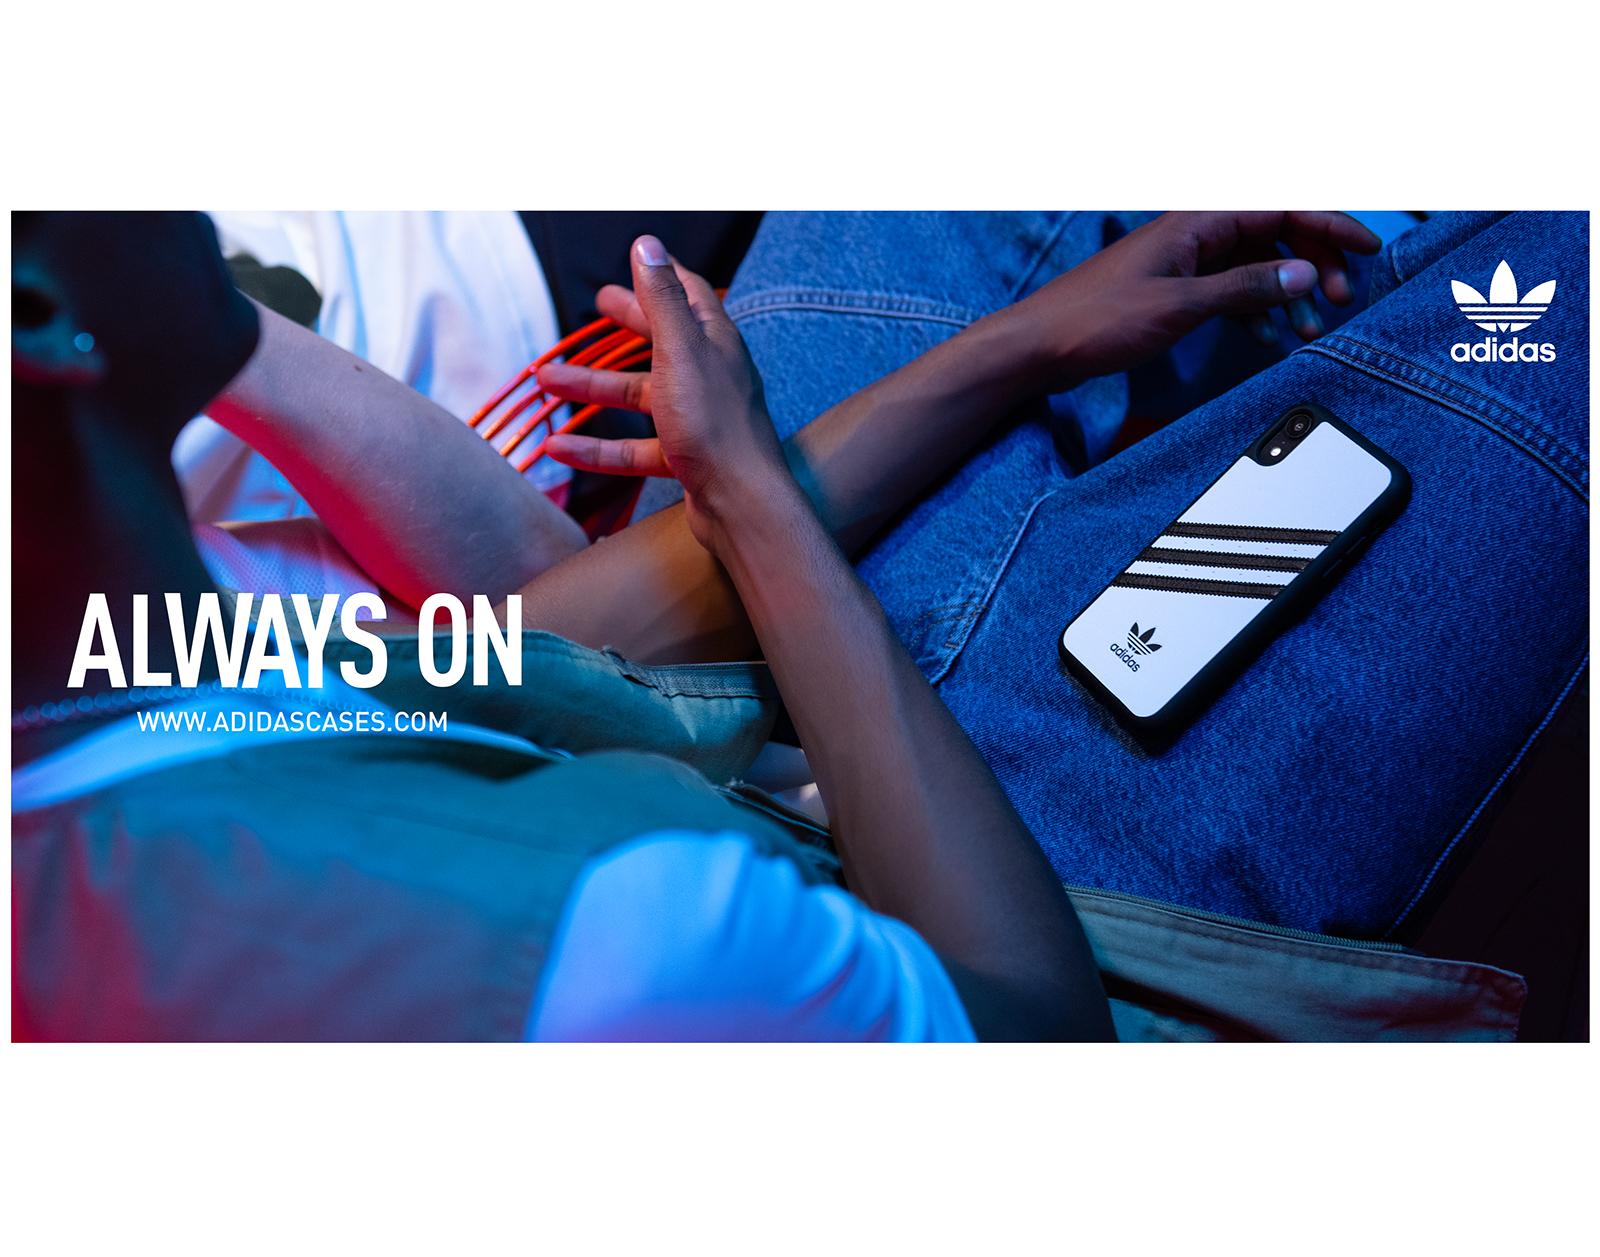 ASS_adidas_Always On 06.jpg